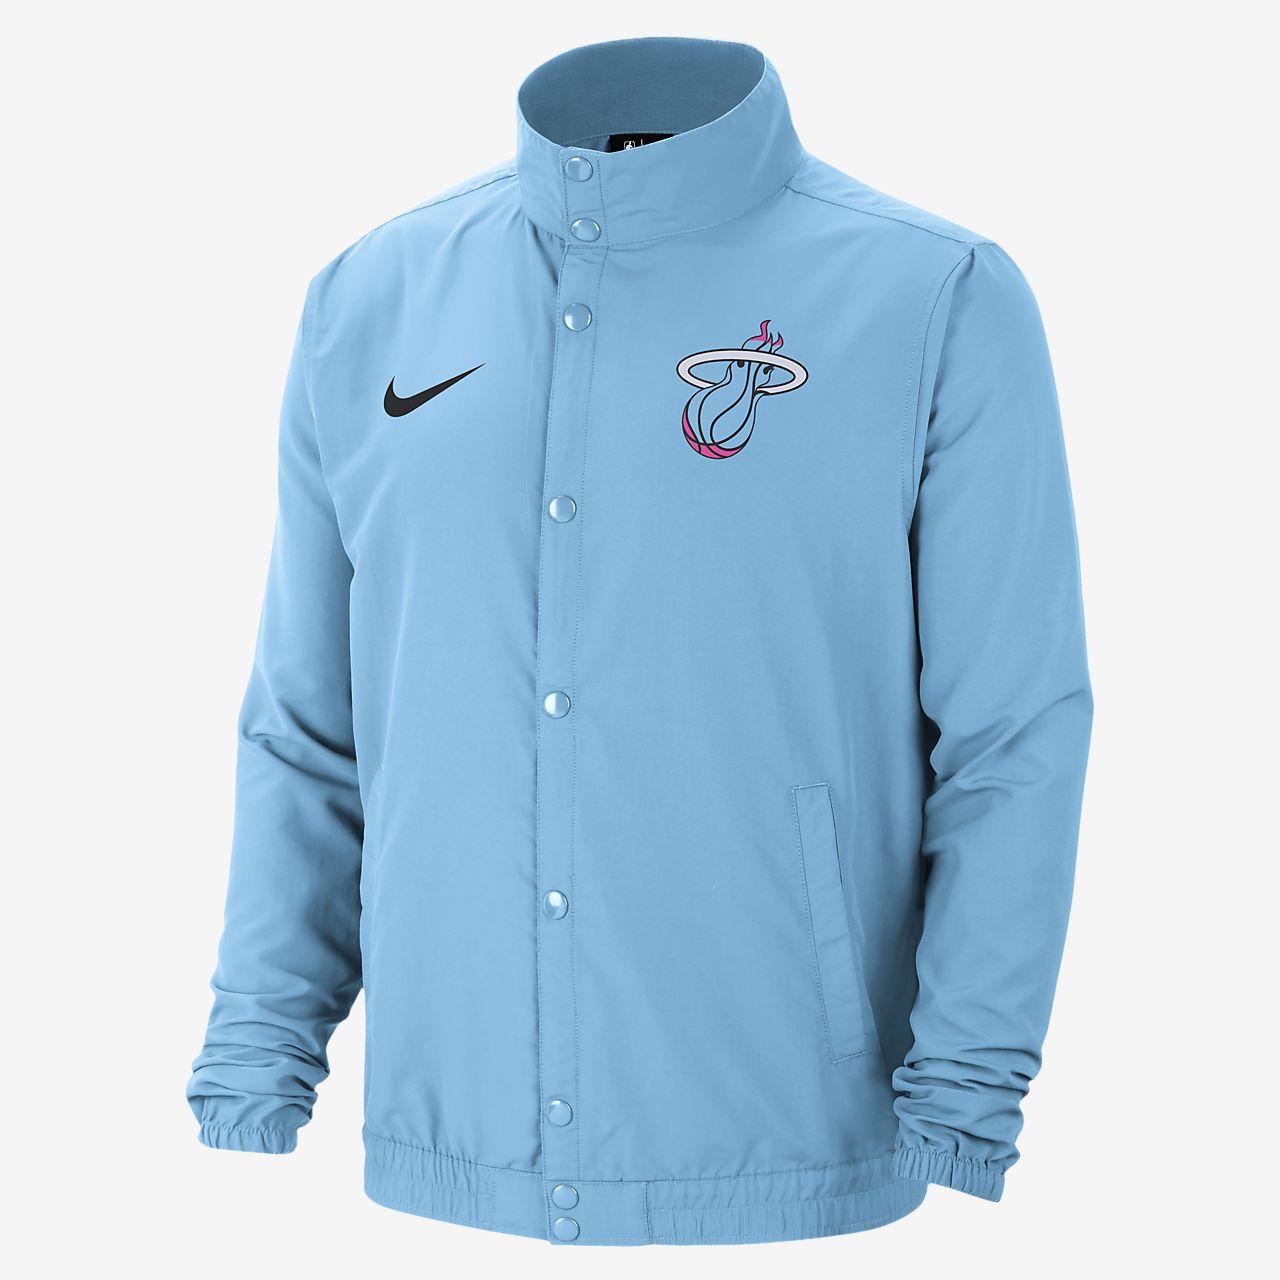 Heat Courtside City Edition Women's Nike NBA Snap Jacket